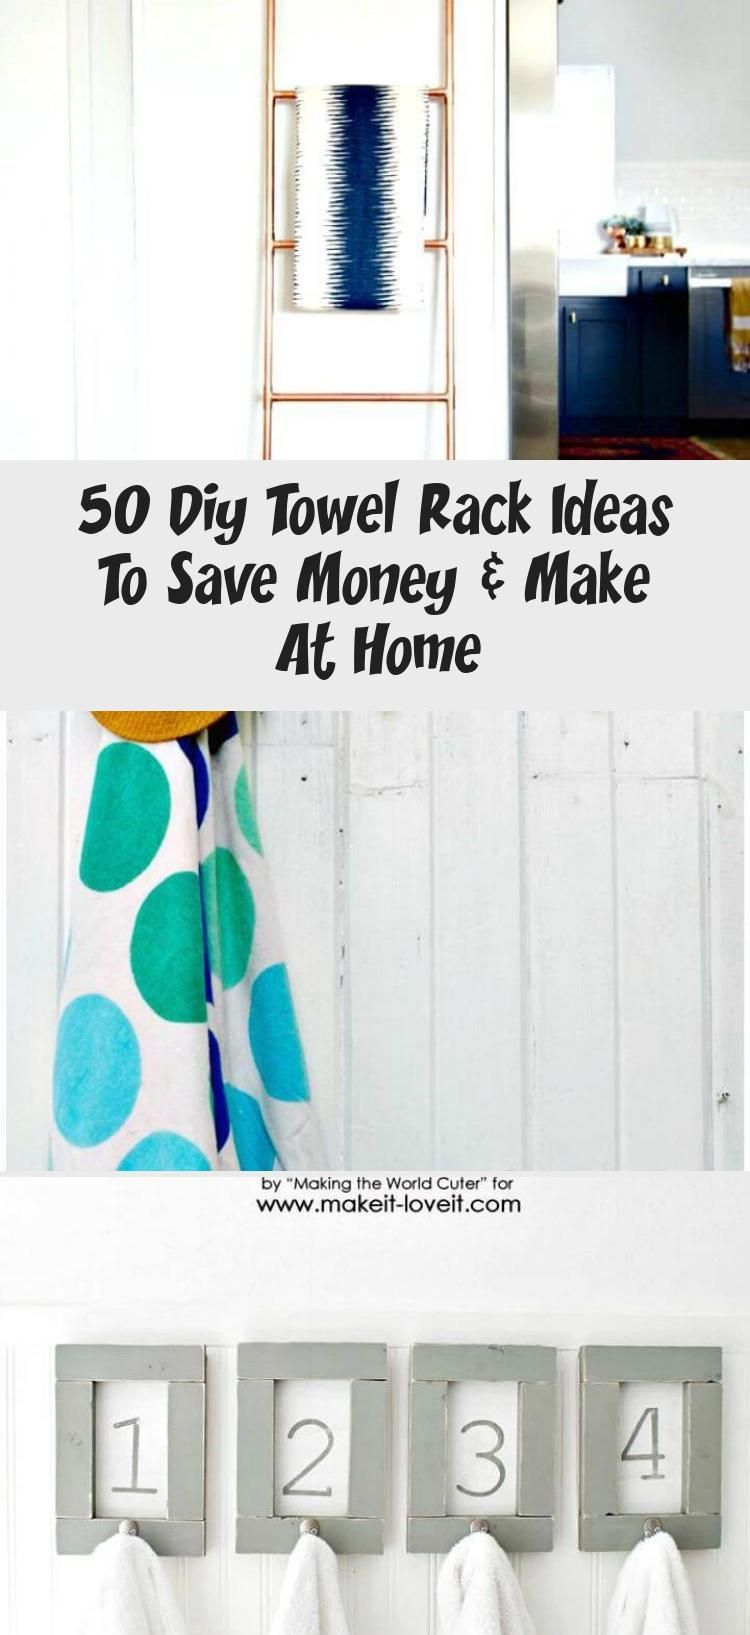 50 Diy Towel Rack Ideas To Save Money Amp Make At Home